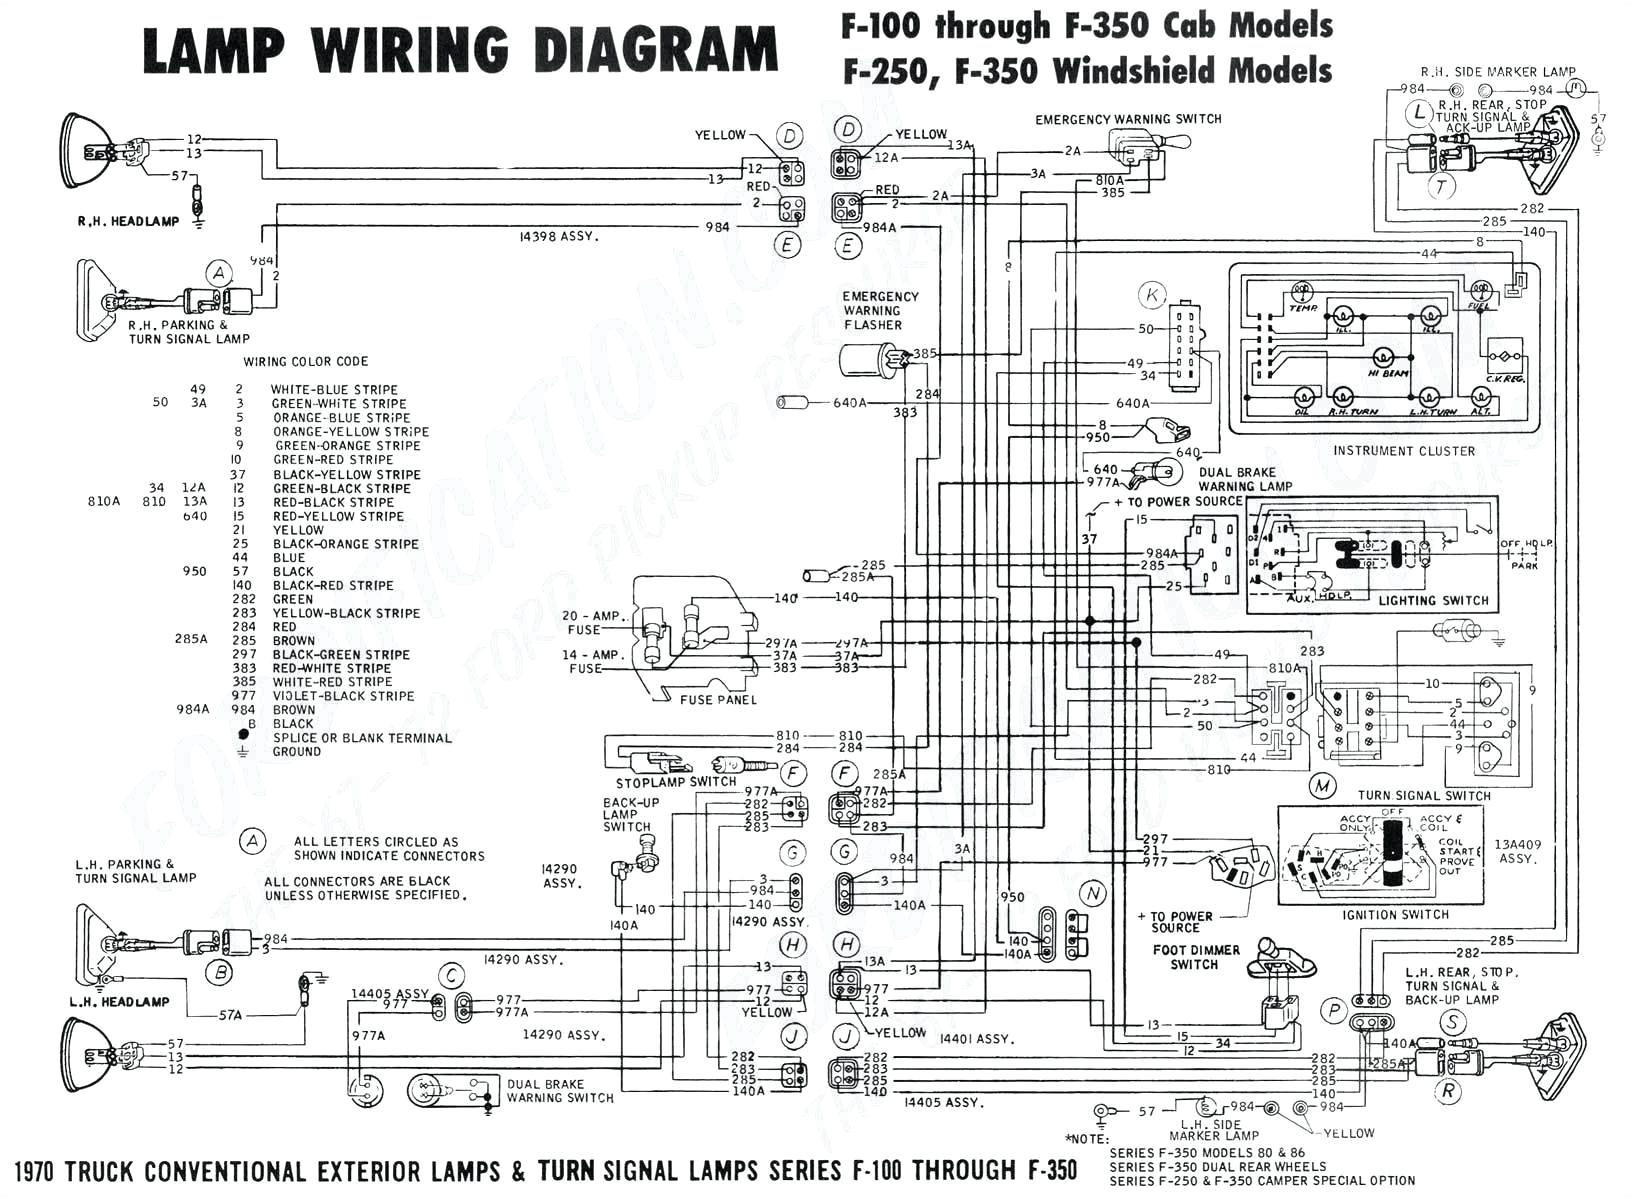 2004 honda civic electrical diagram wwwfaxonautoliteraturecom diagram http wwwfaxonautoliteraturecom 2005toyotacamrywiring